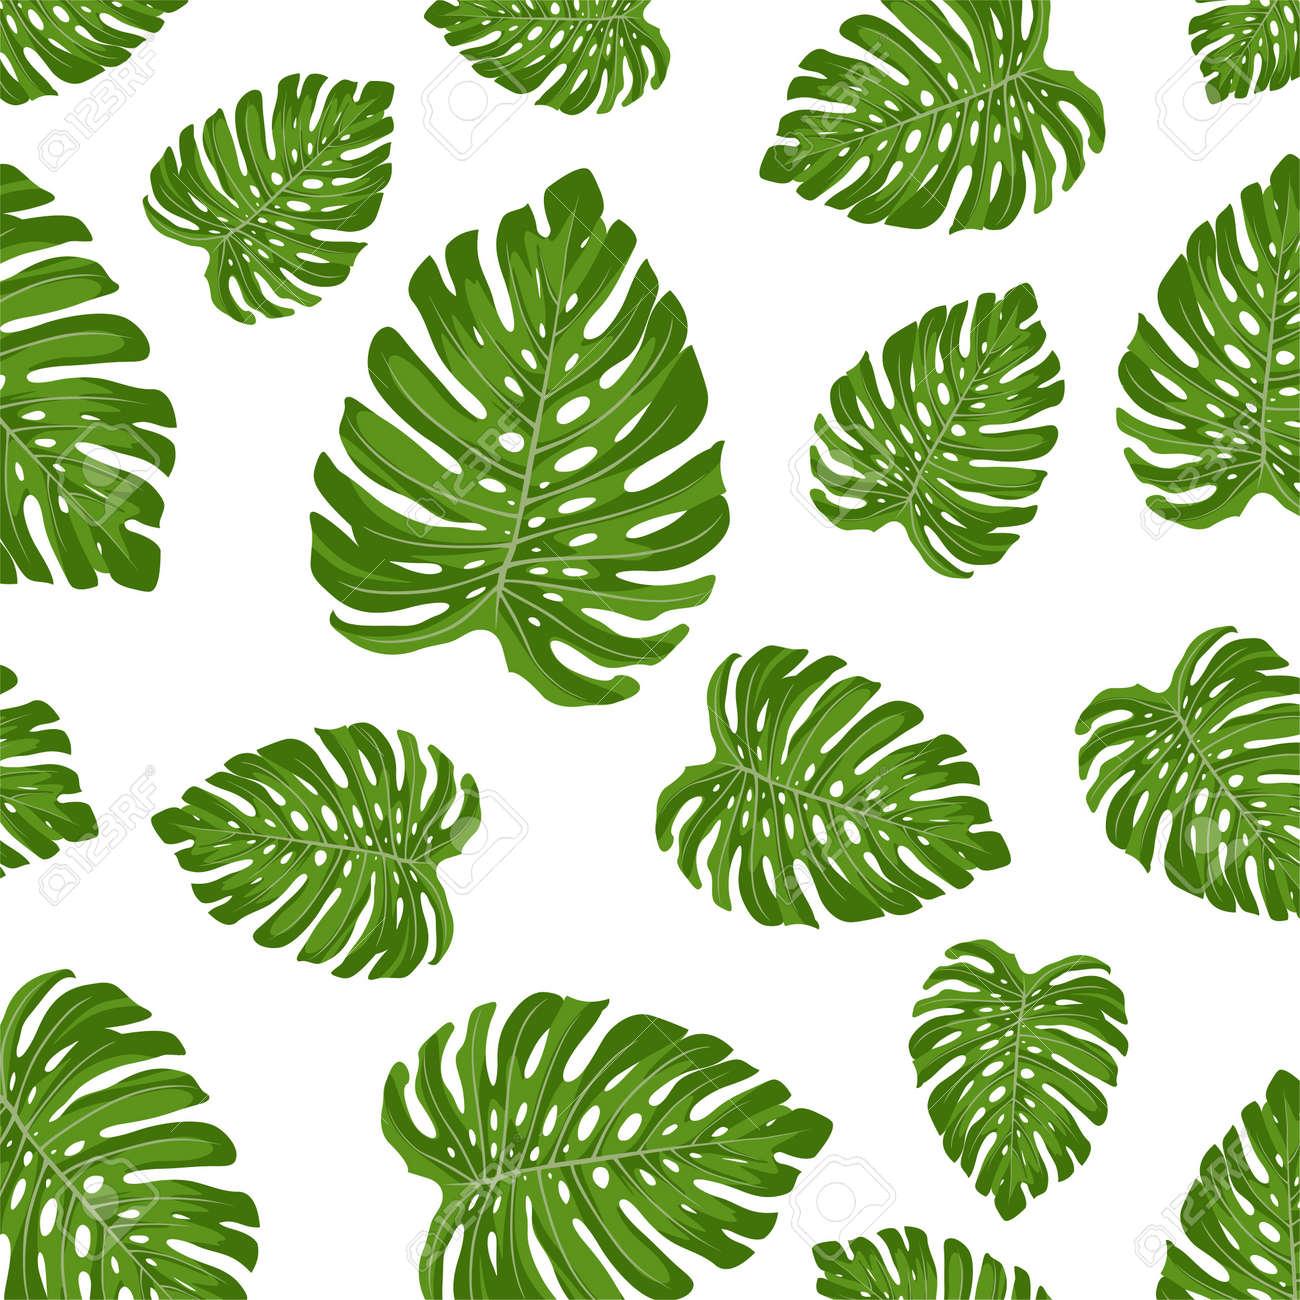 Monstera deliciosa leaf seamless pattern - 156660250